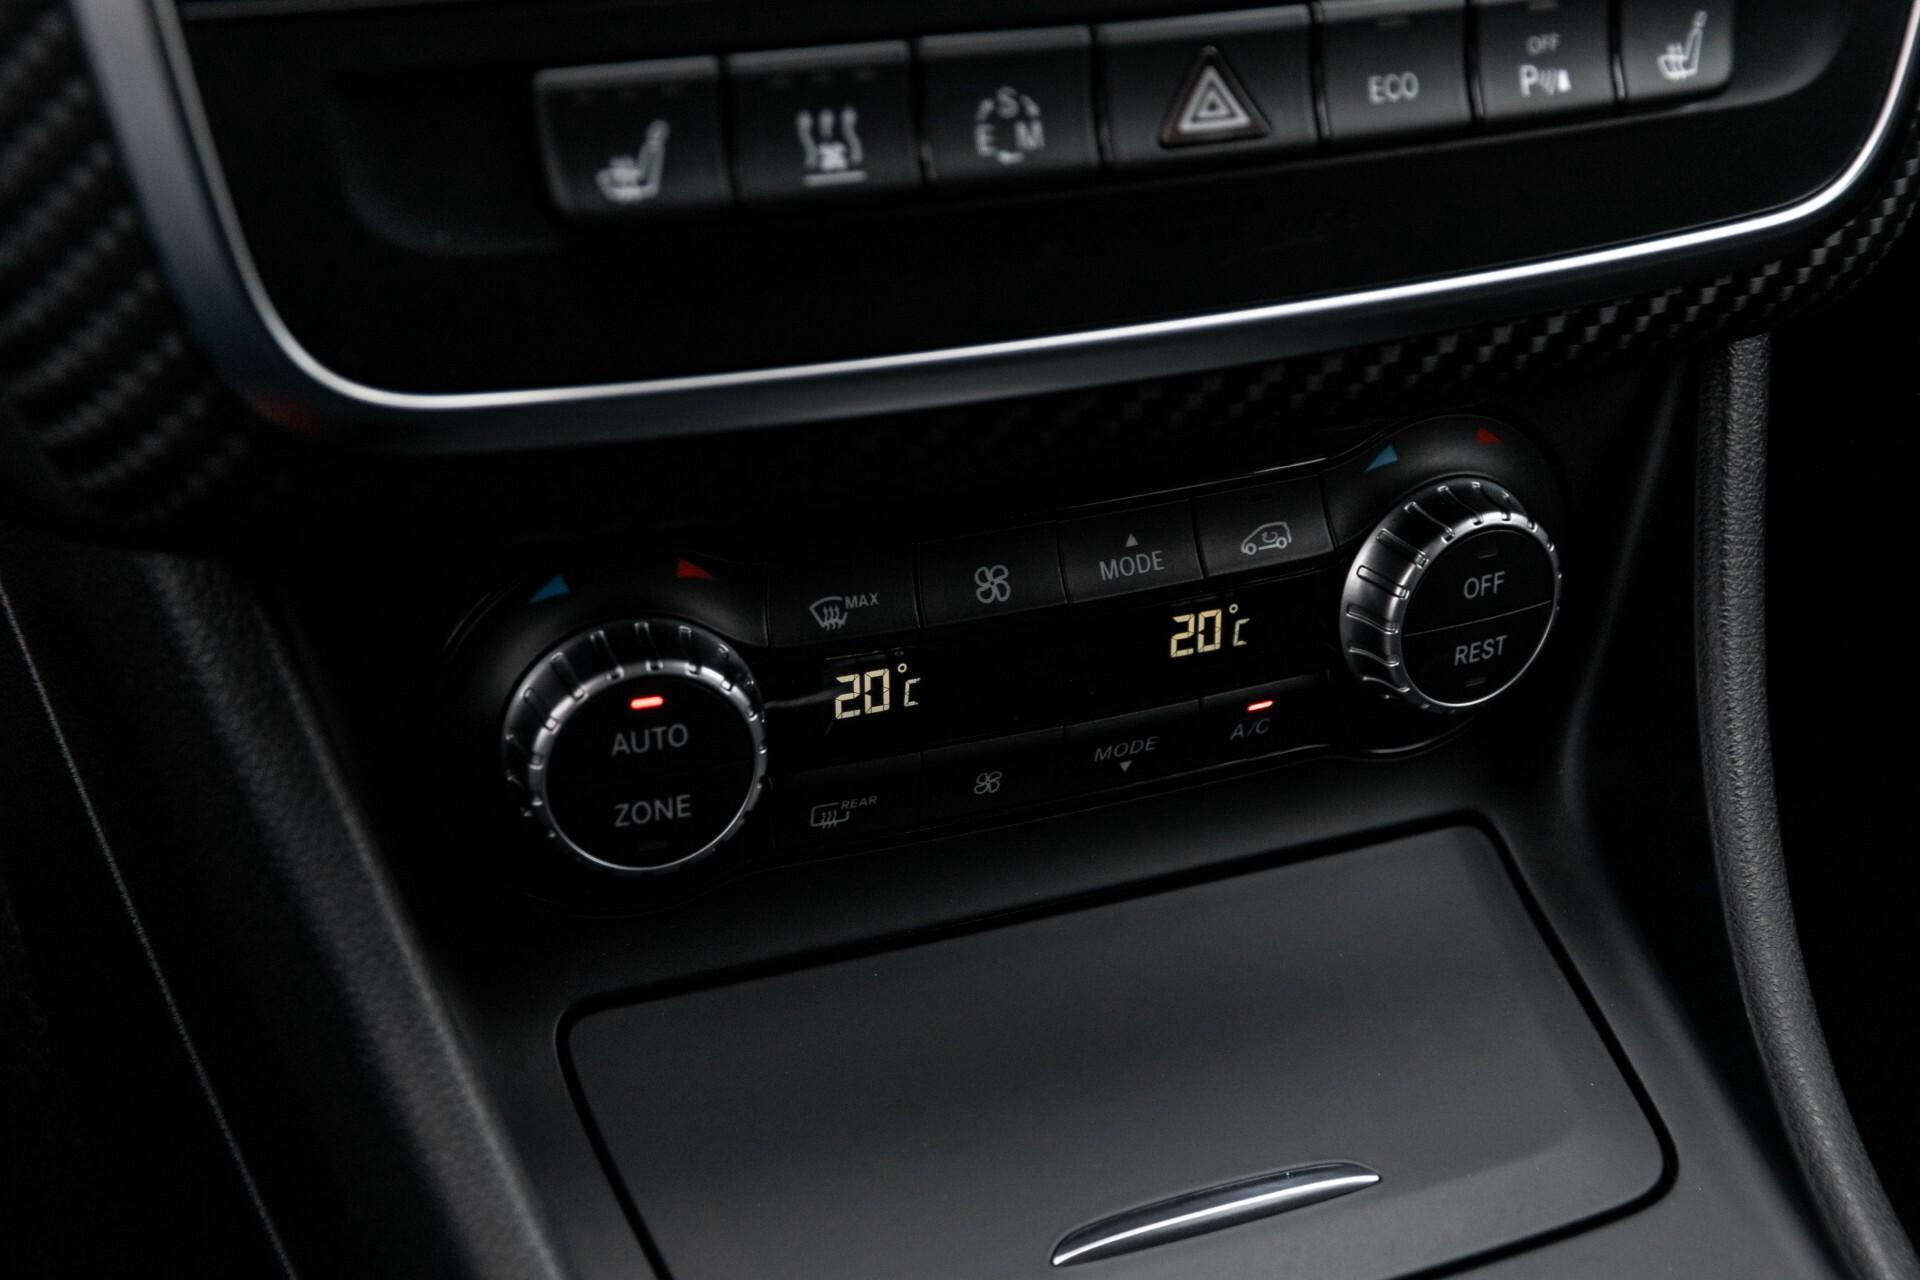 Mercedes-Benz A-Klasse 250 Sport AMG Panorama/Standkachel/Mem/Harman-Kardon/Distronic/Camera/Com Aut7 Foto 35